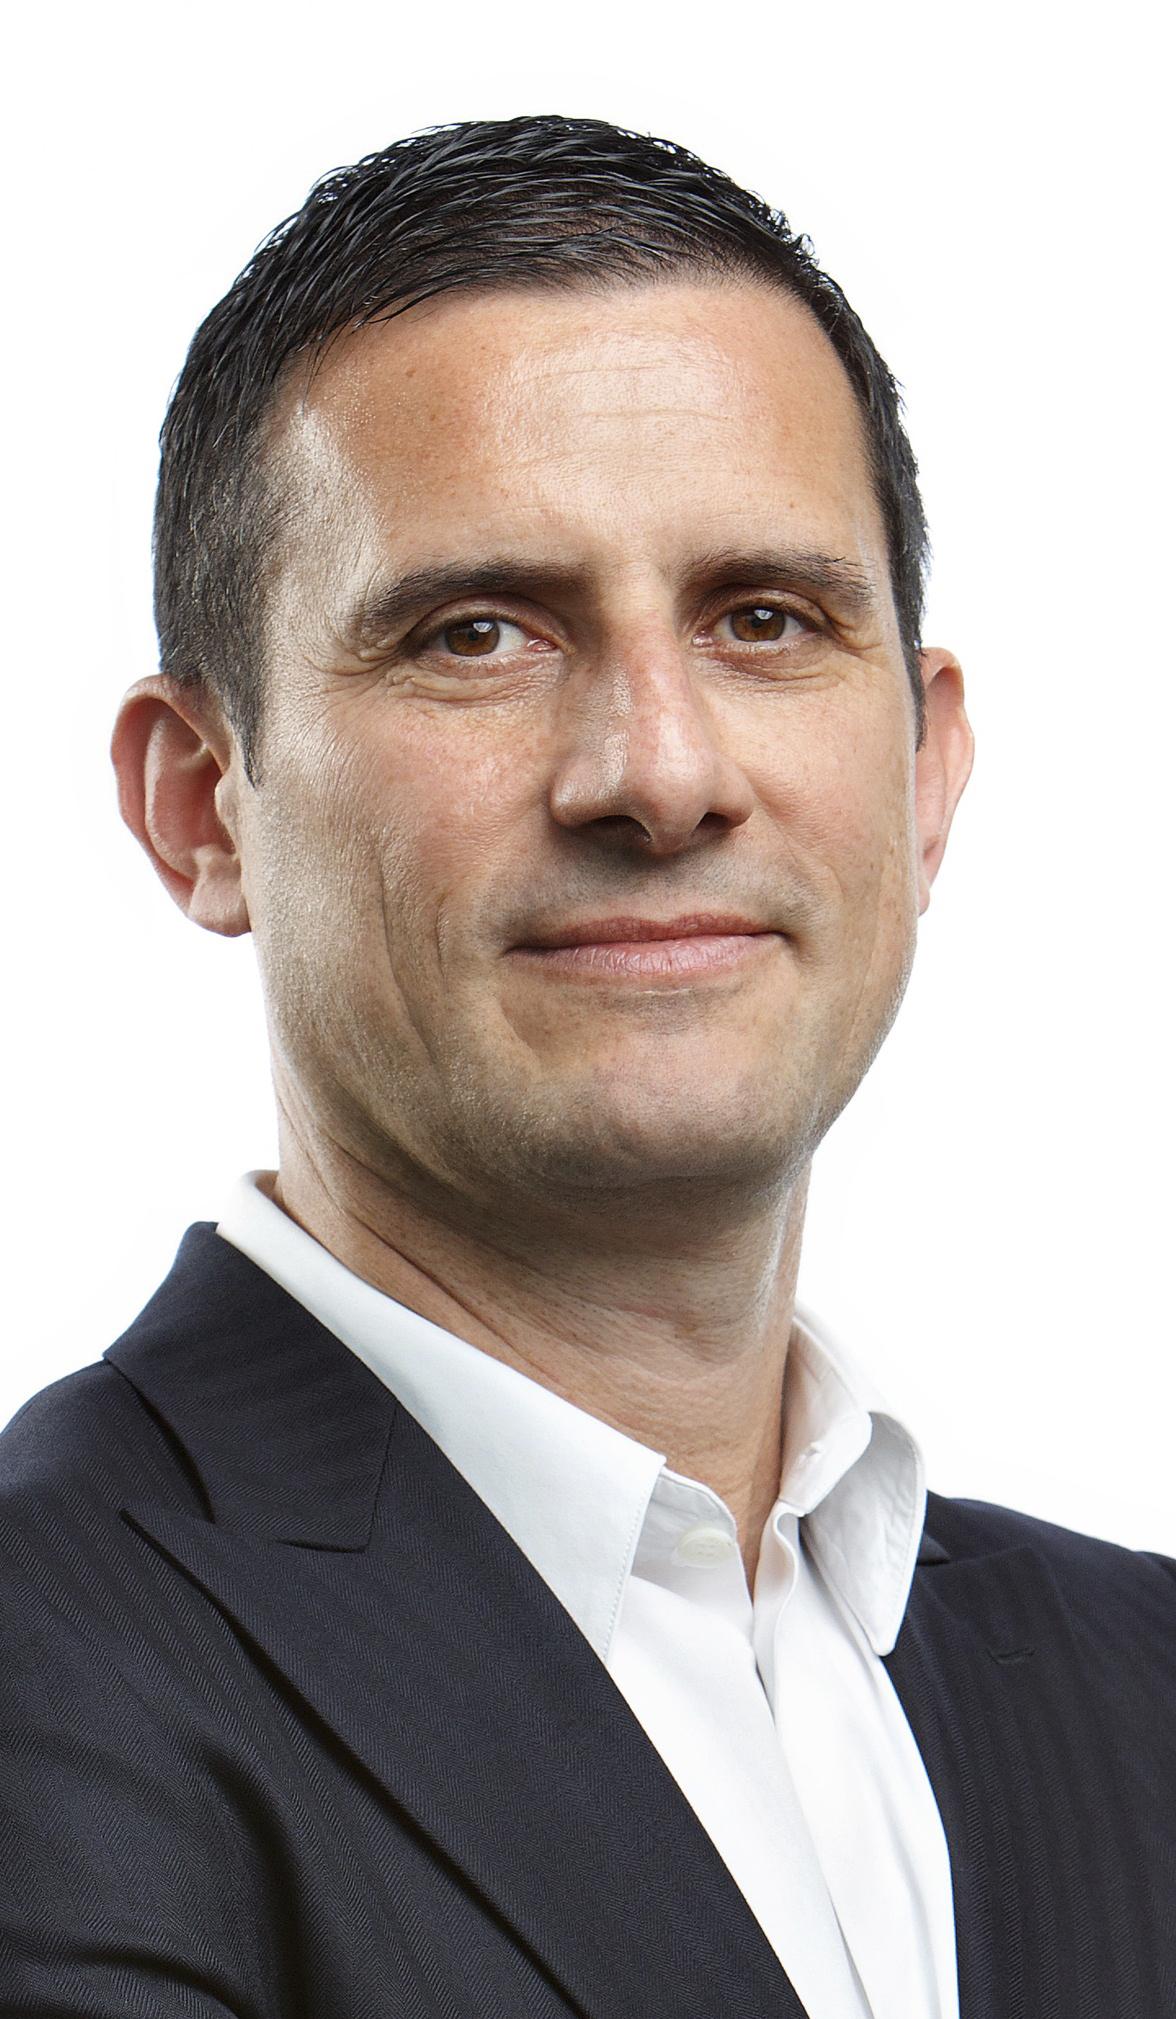 Jean-Claude Ghinozzi